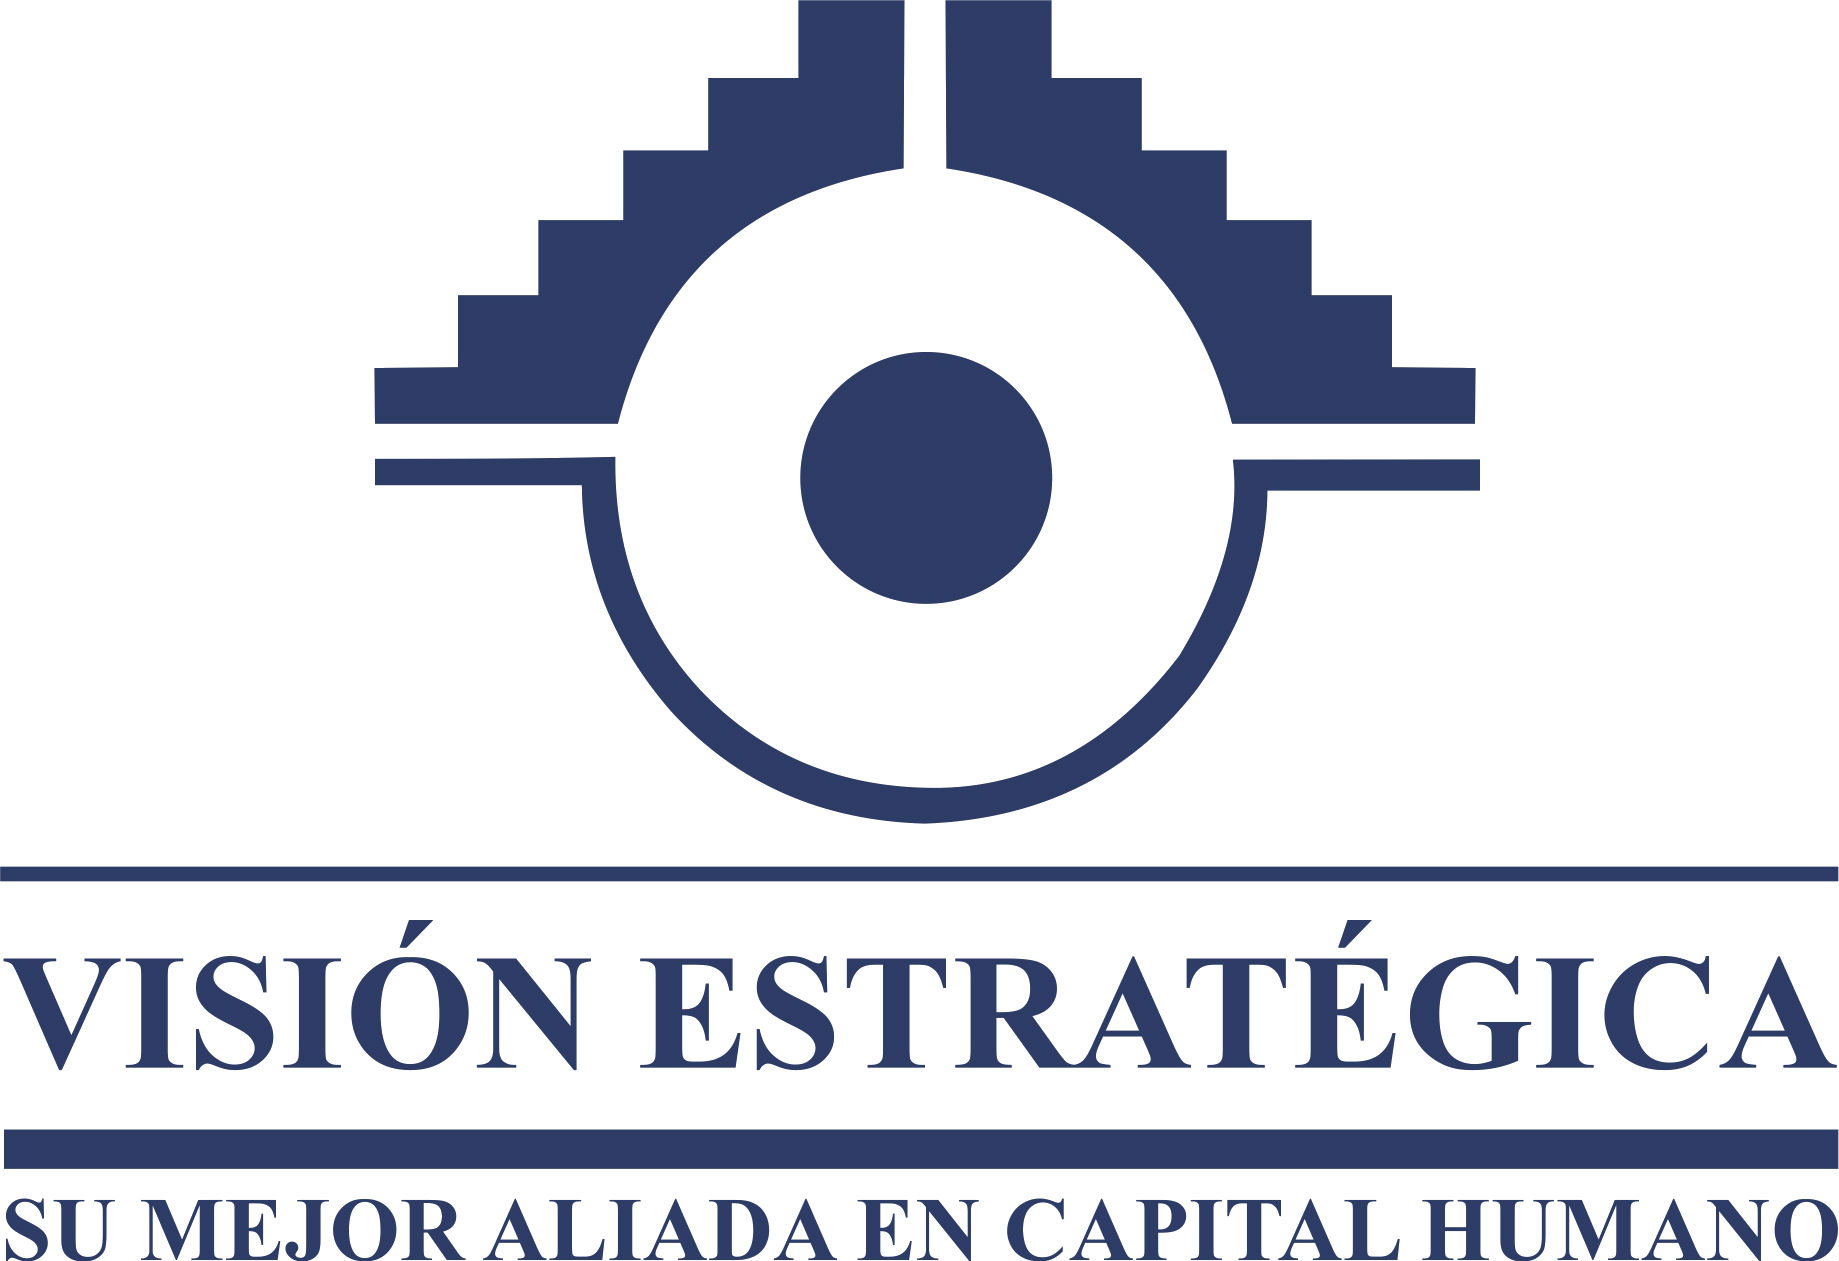 Perfil de Visión Estratégica